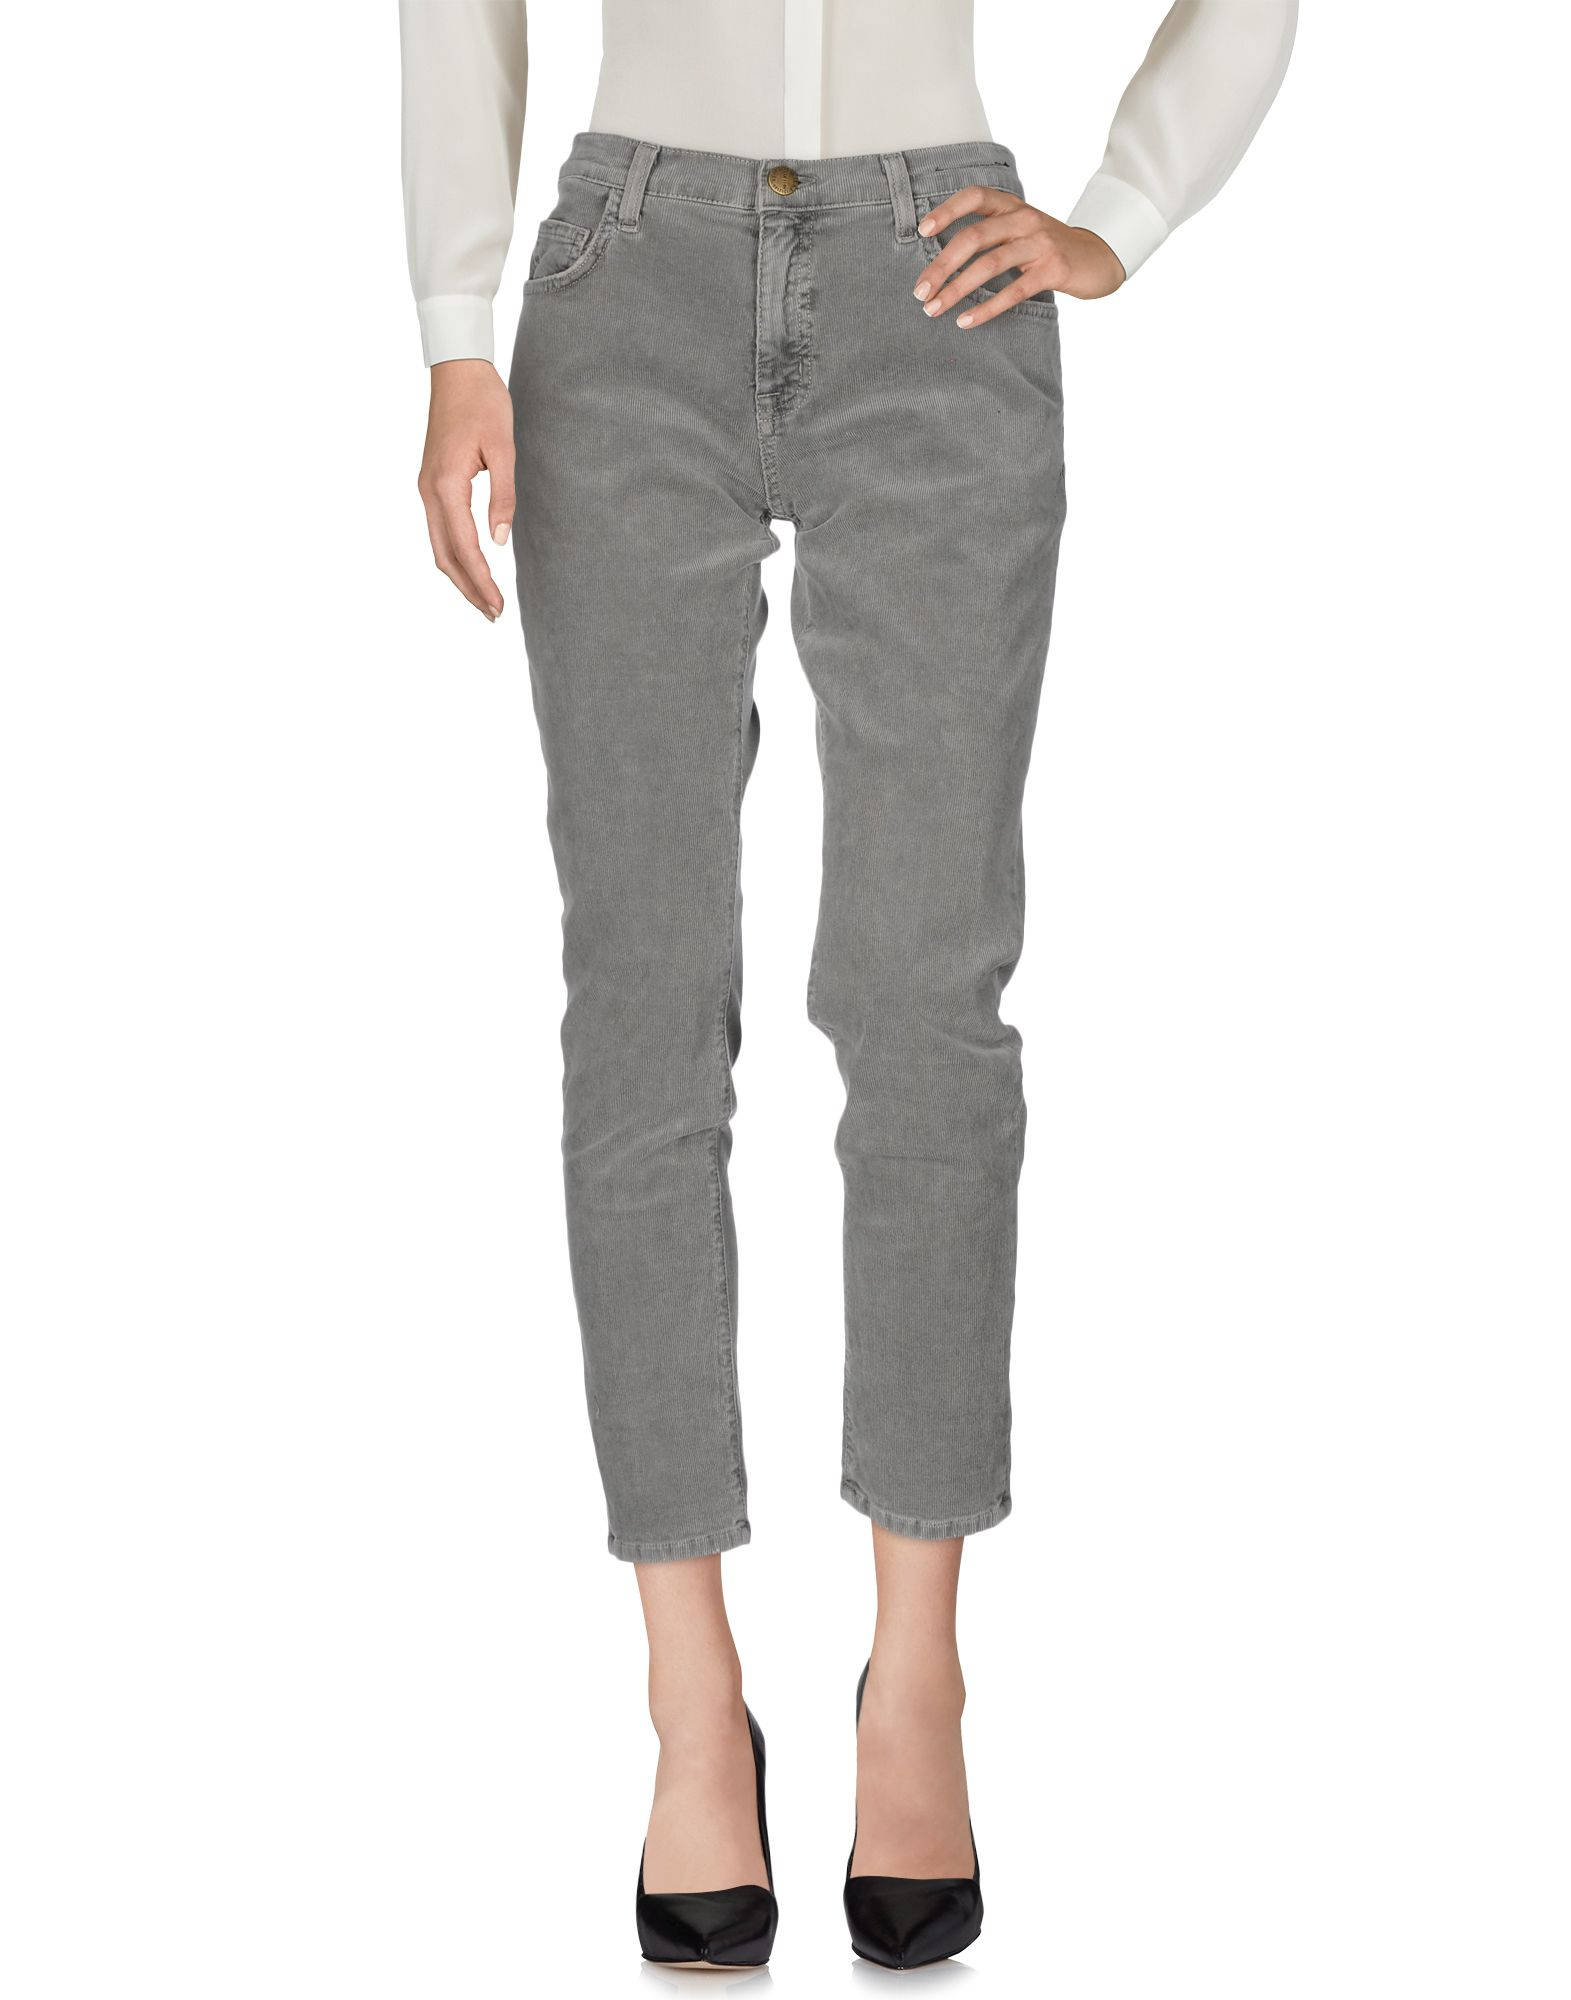 Pantalone Current/Elliott Donna - Acquista online su 11LTn7F3C5